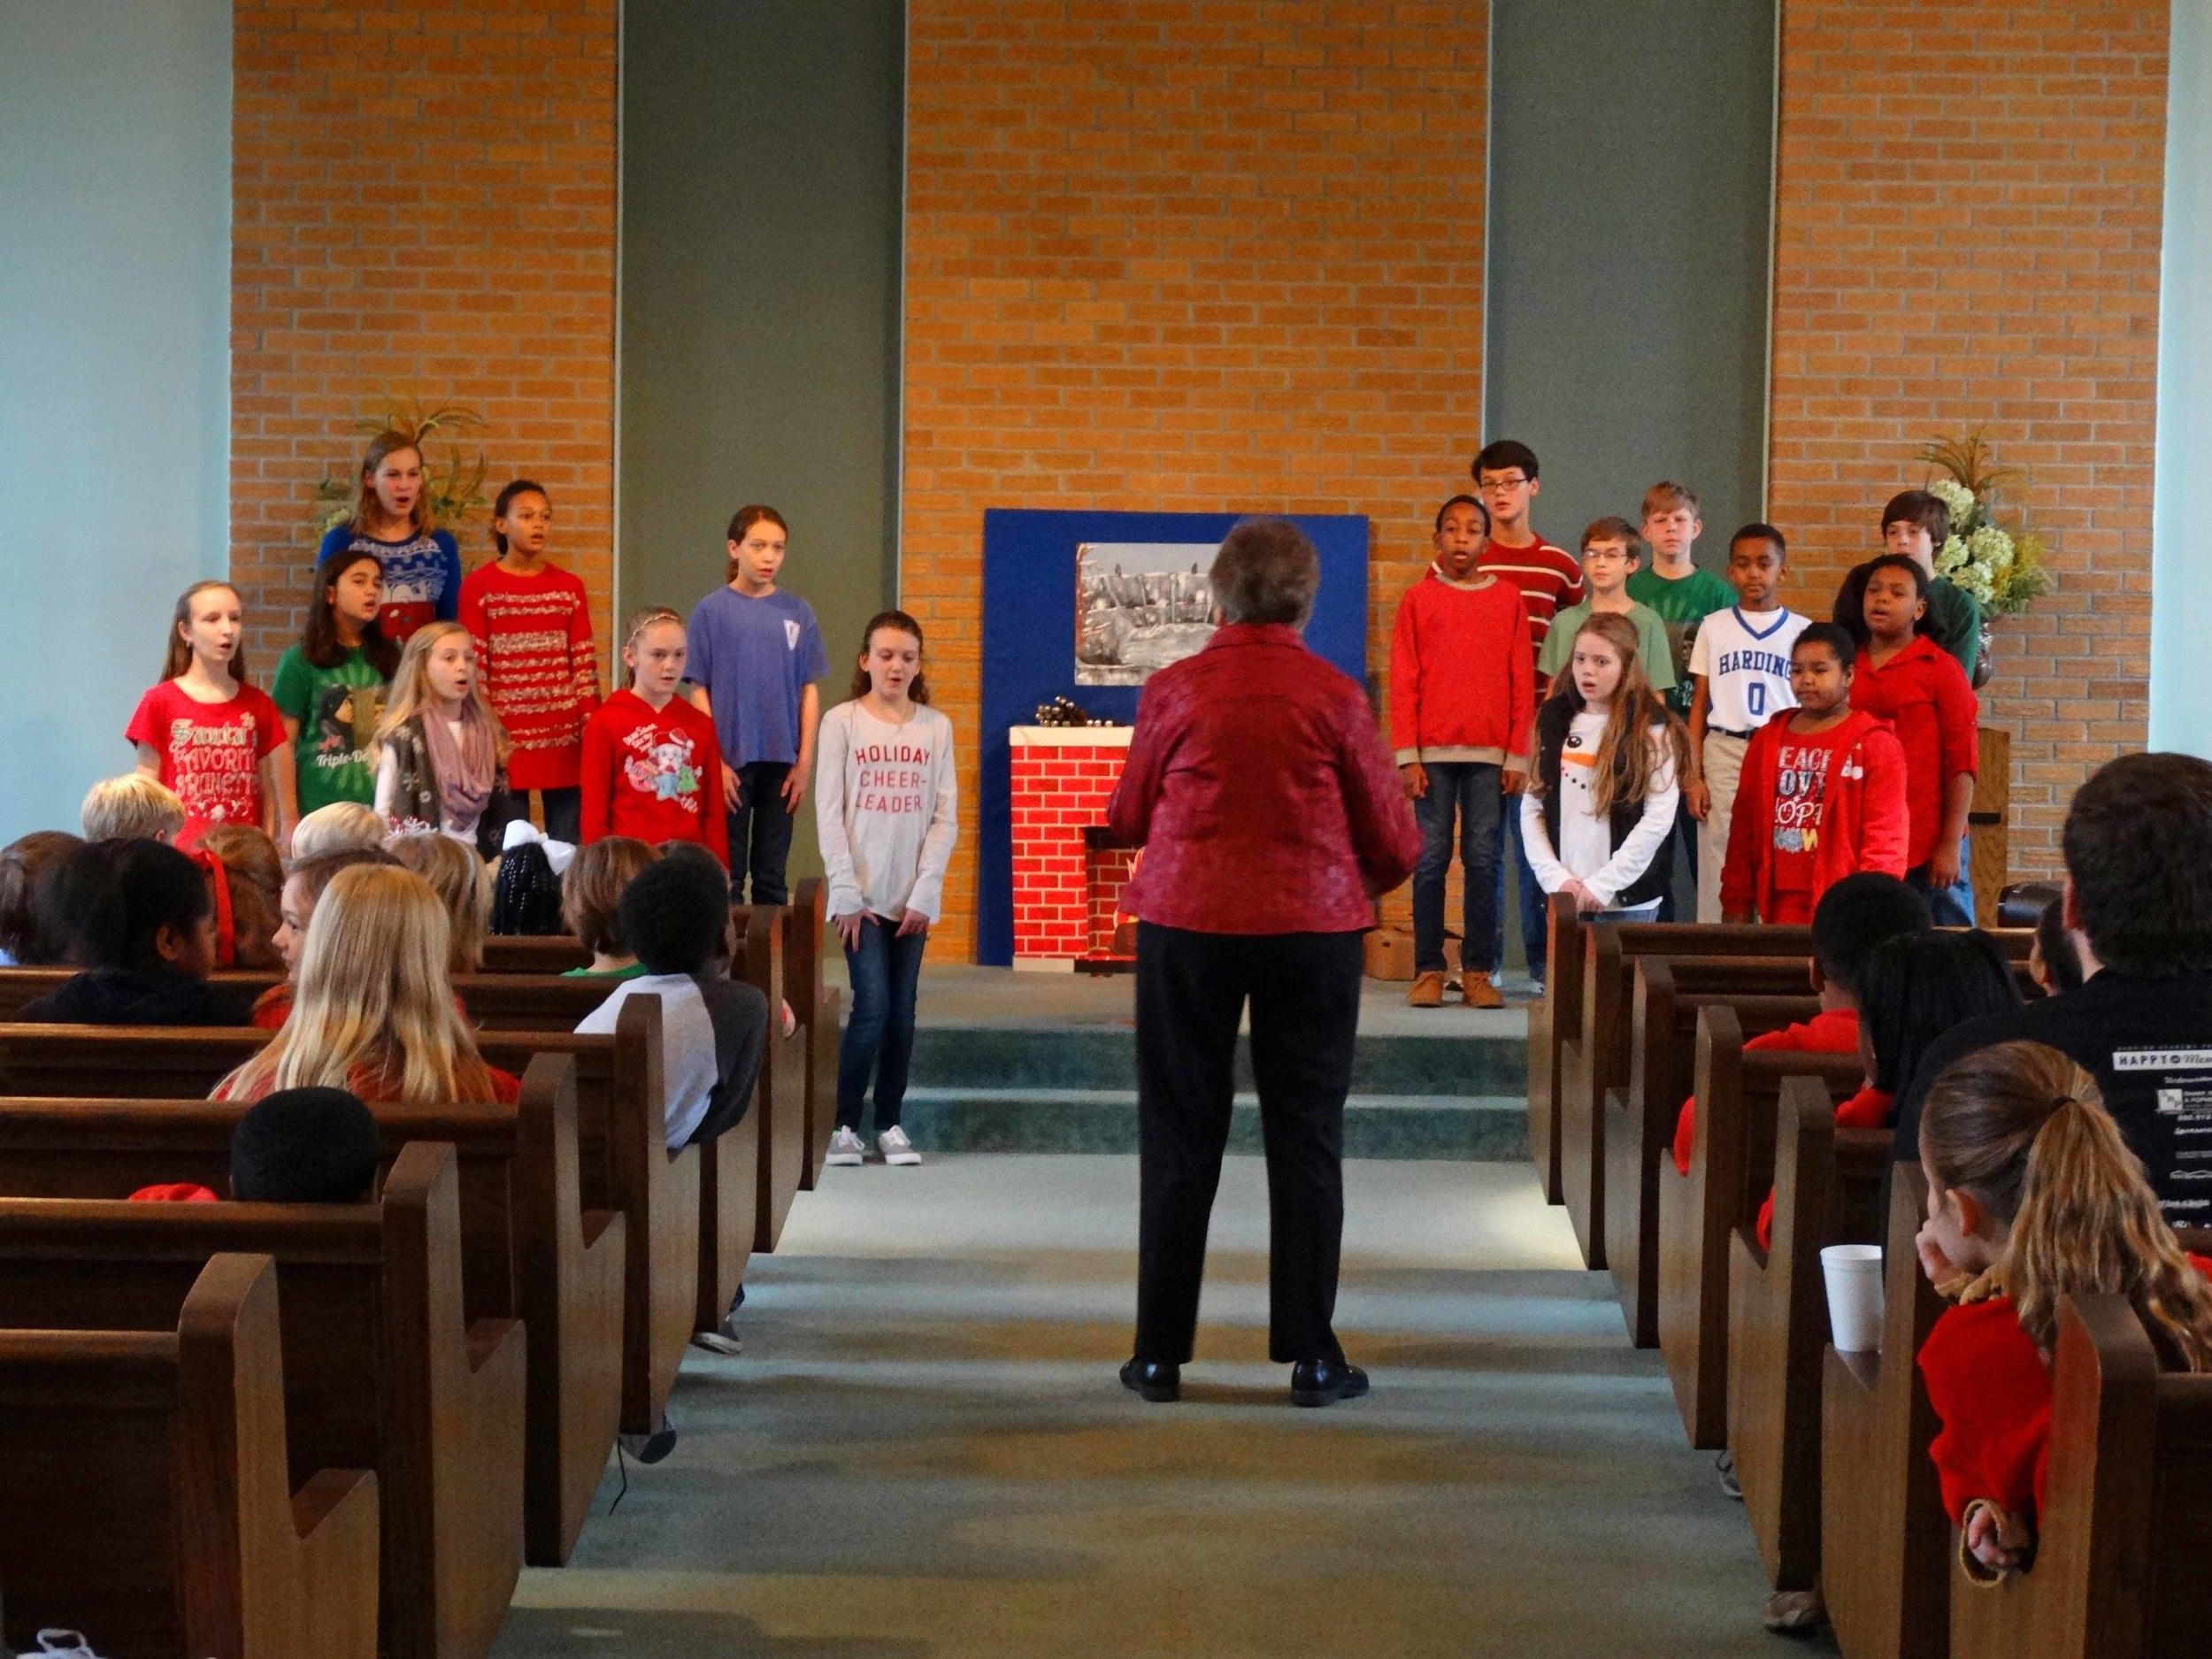 Dec19 WSLSrecorderEnsemble&Choir15.jpg